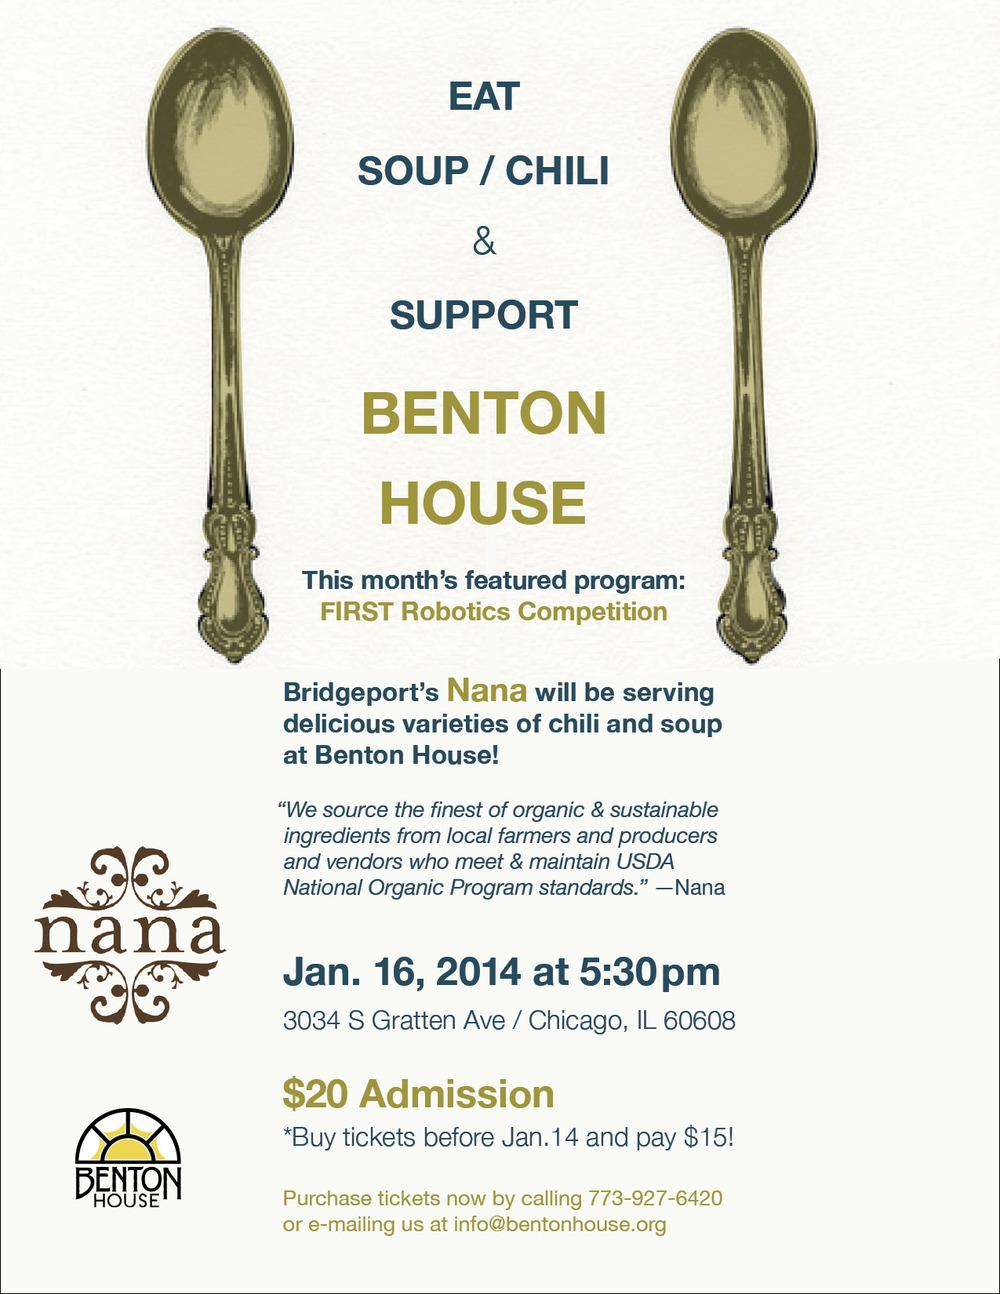 soup & chilli benefit poster_edits5.jpg